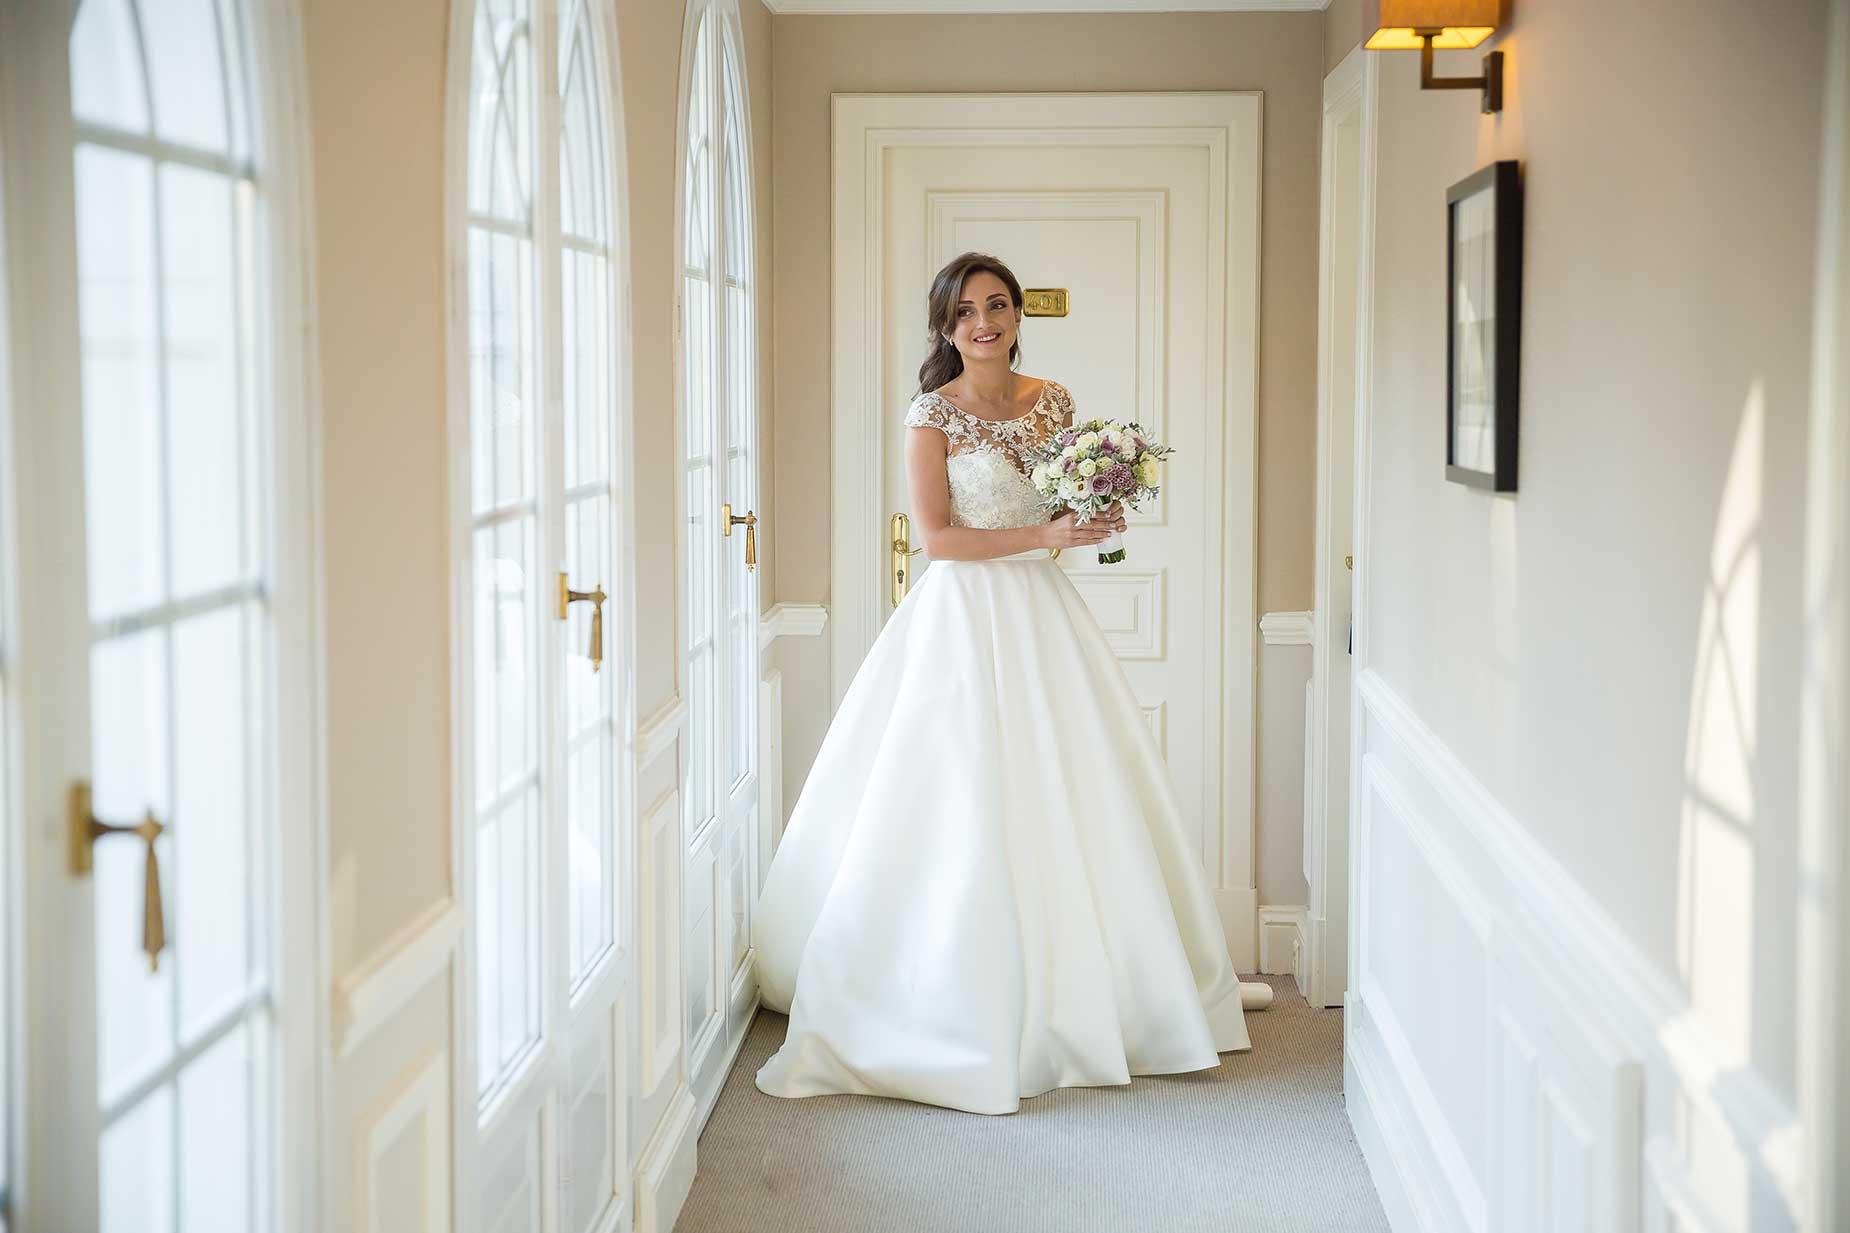 Althoff Hotel Villa Belrose bride